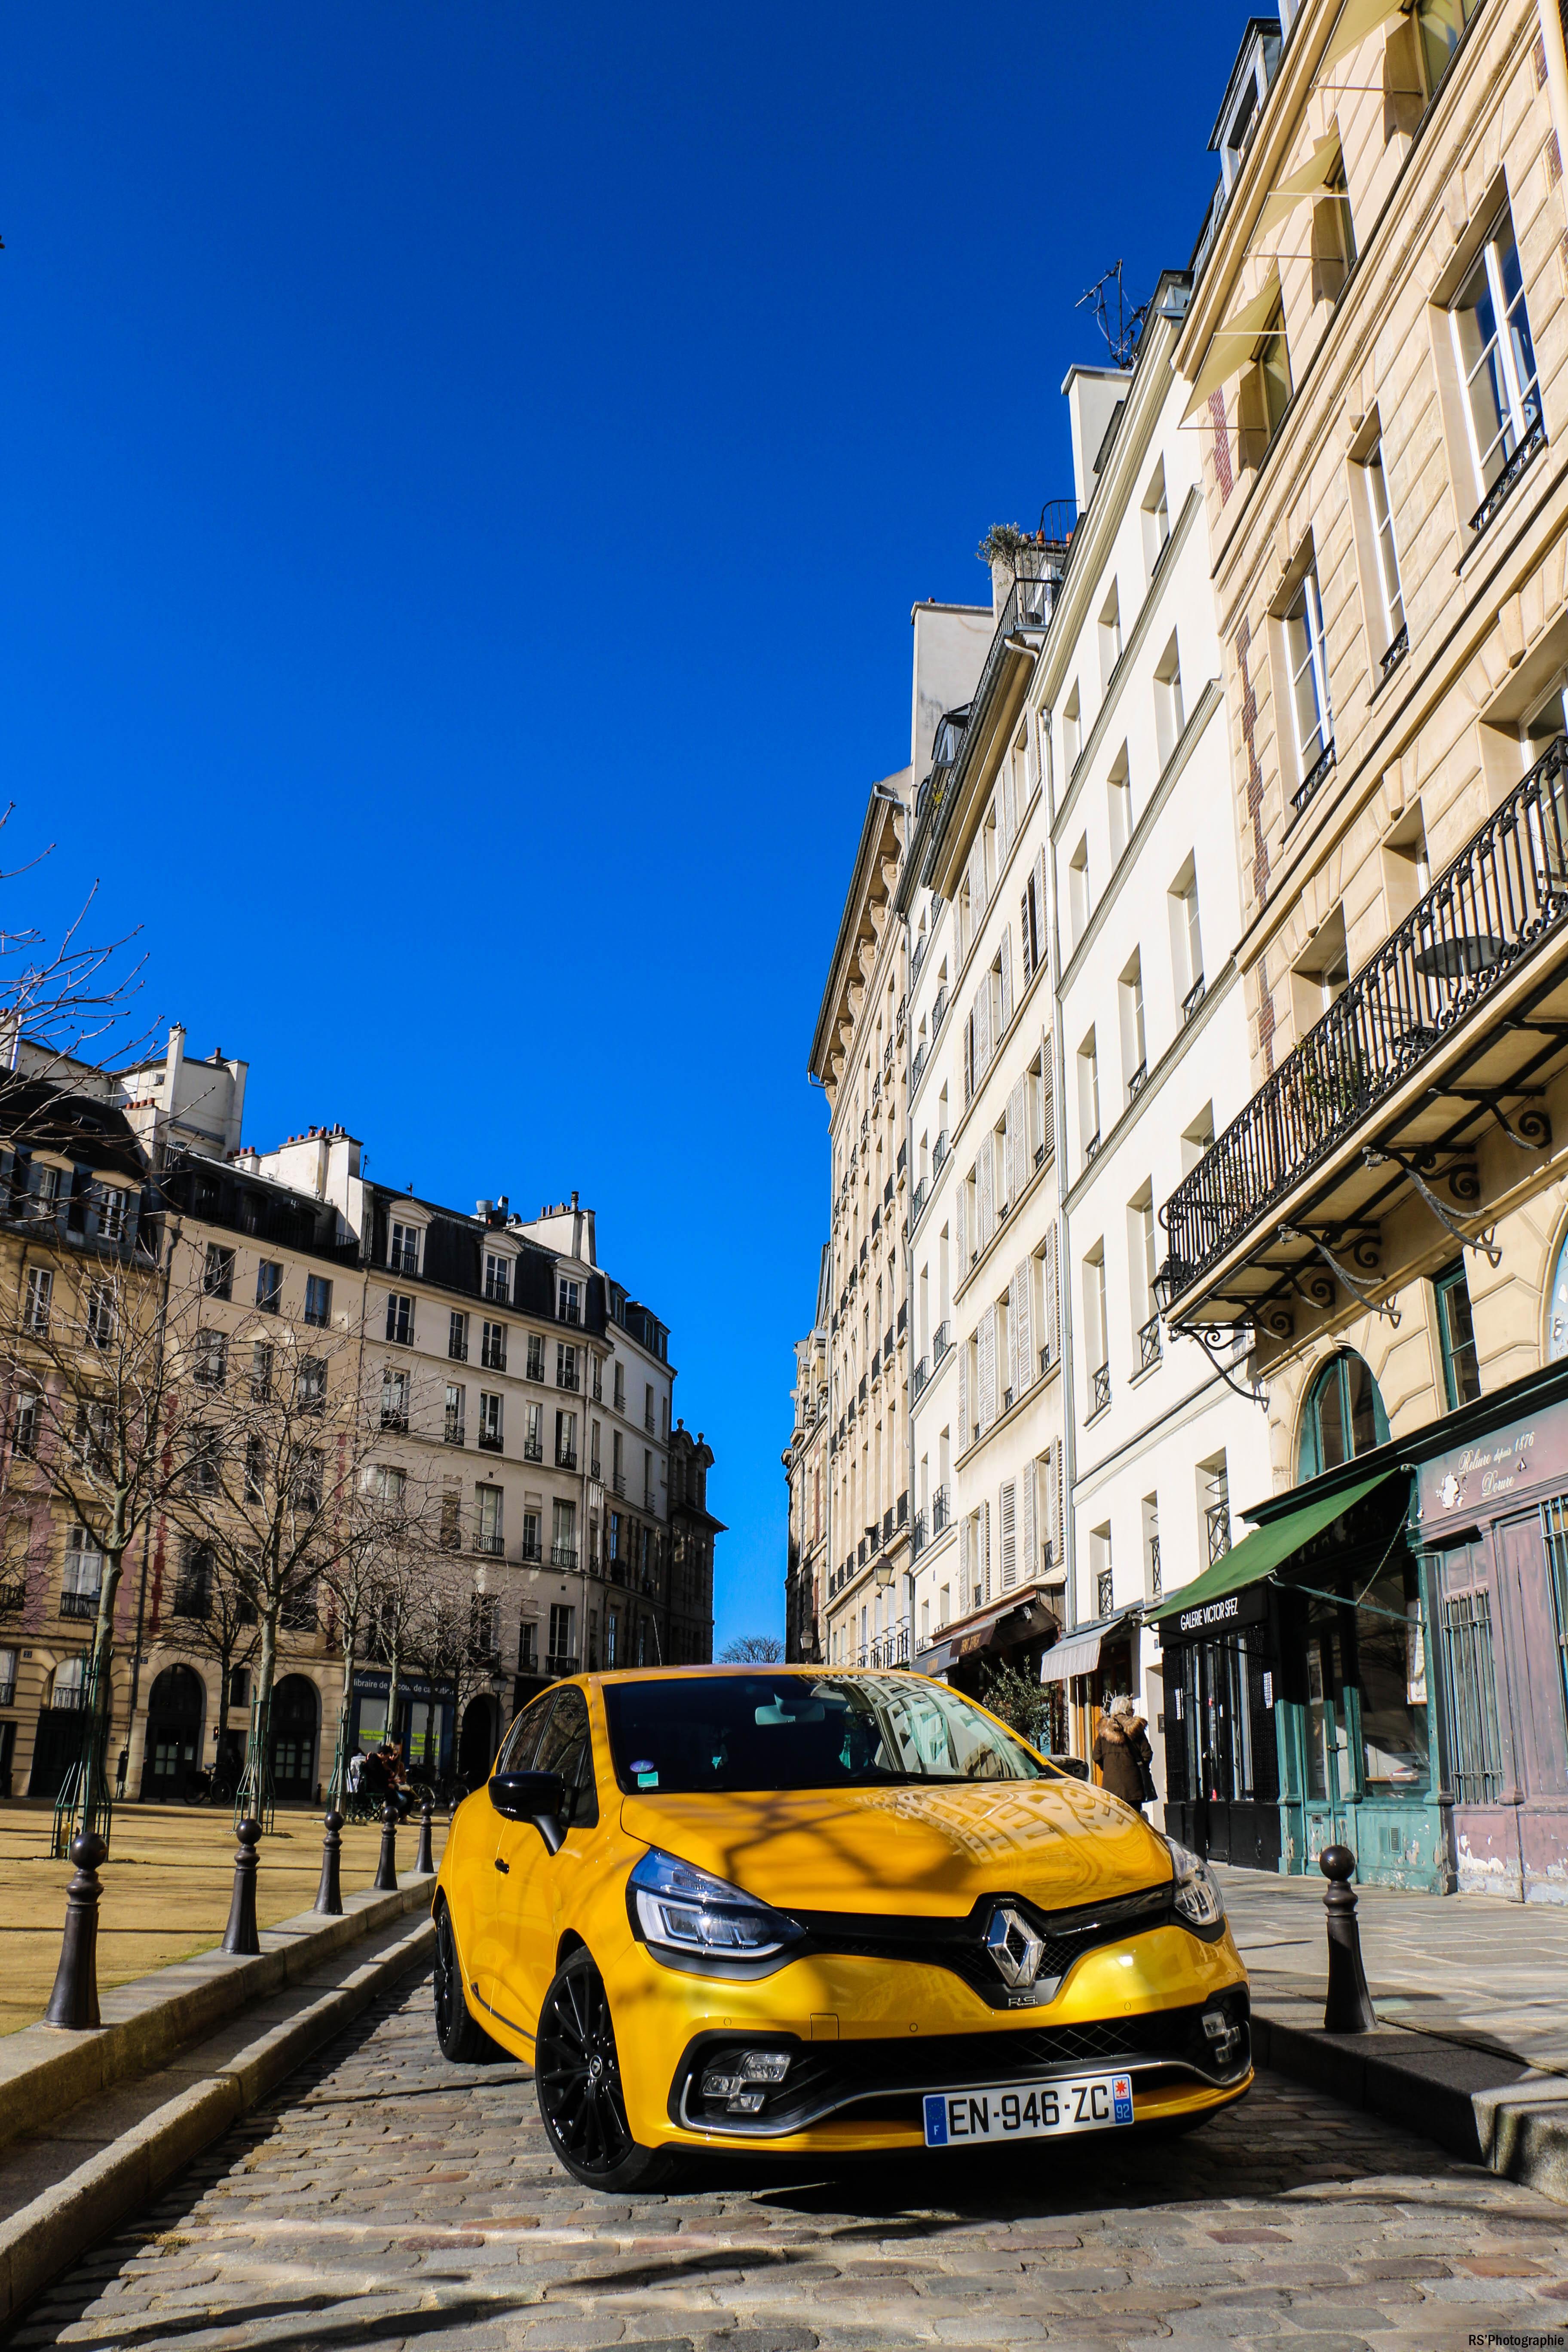 RenaultclioIVRSTrophy45-renault-clio-RS-trophy-avant-front-Arnaud Demasier-RSPhotographie